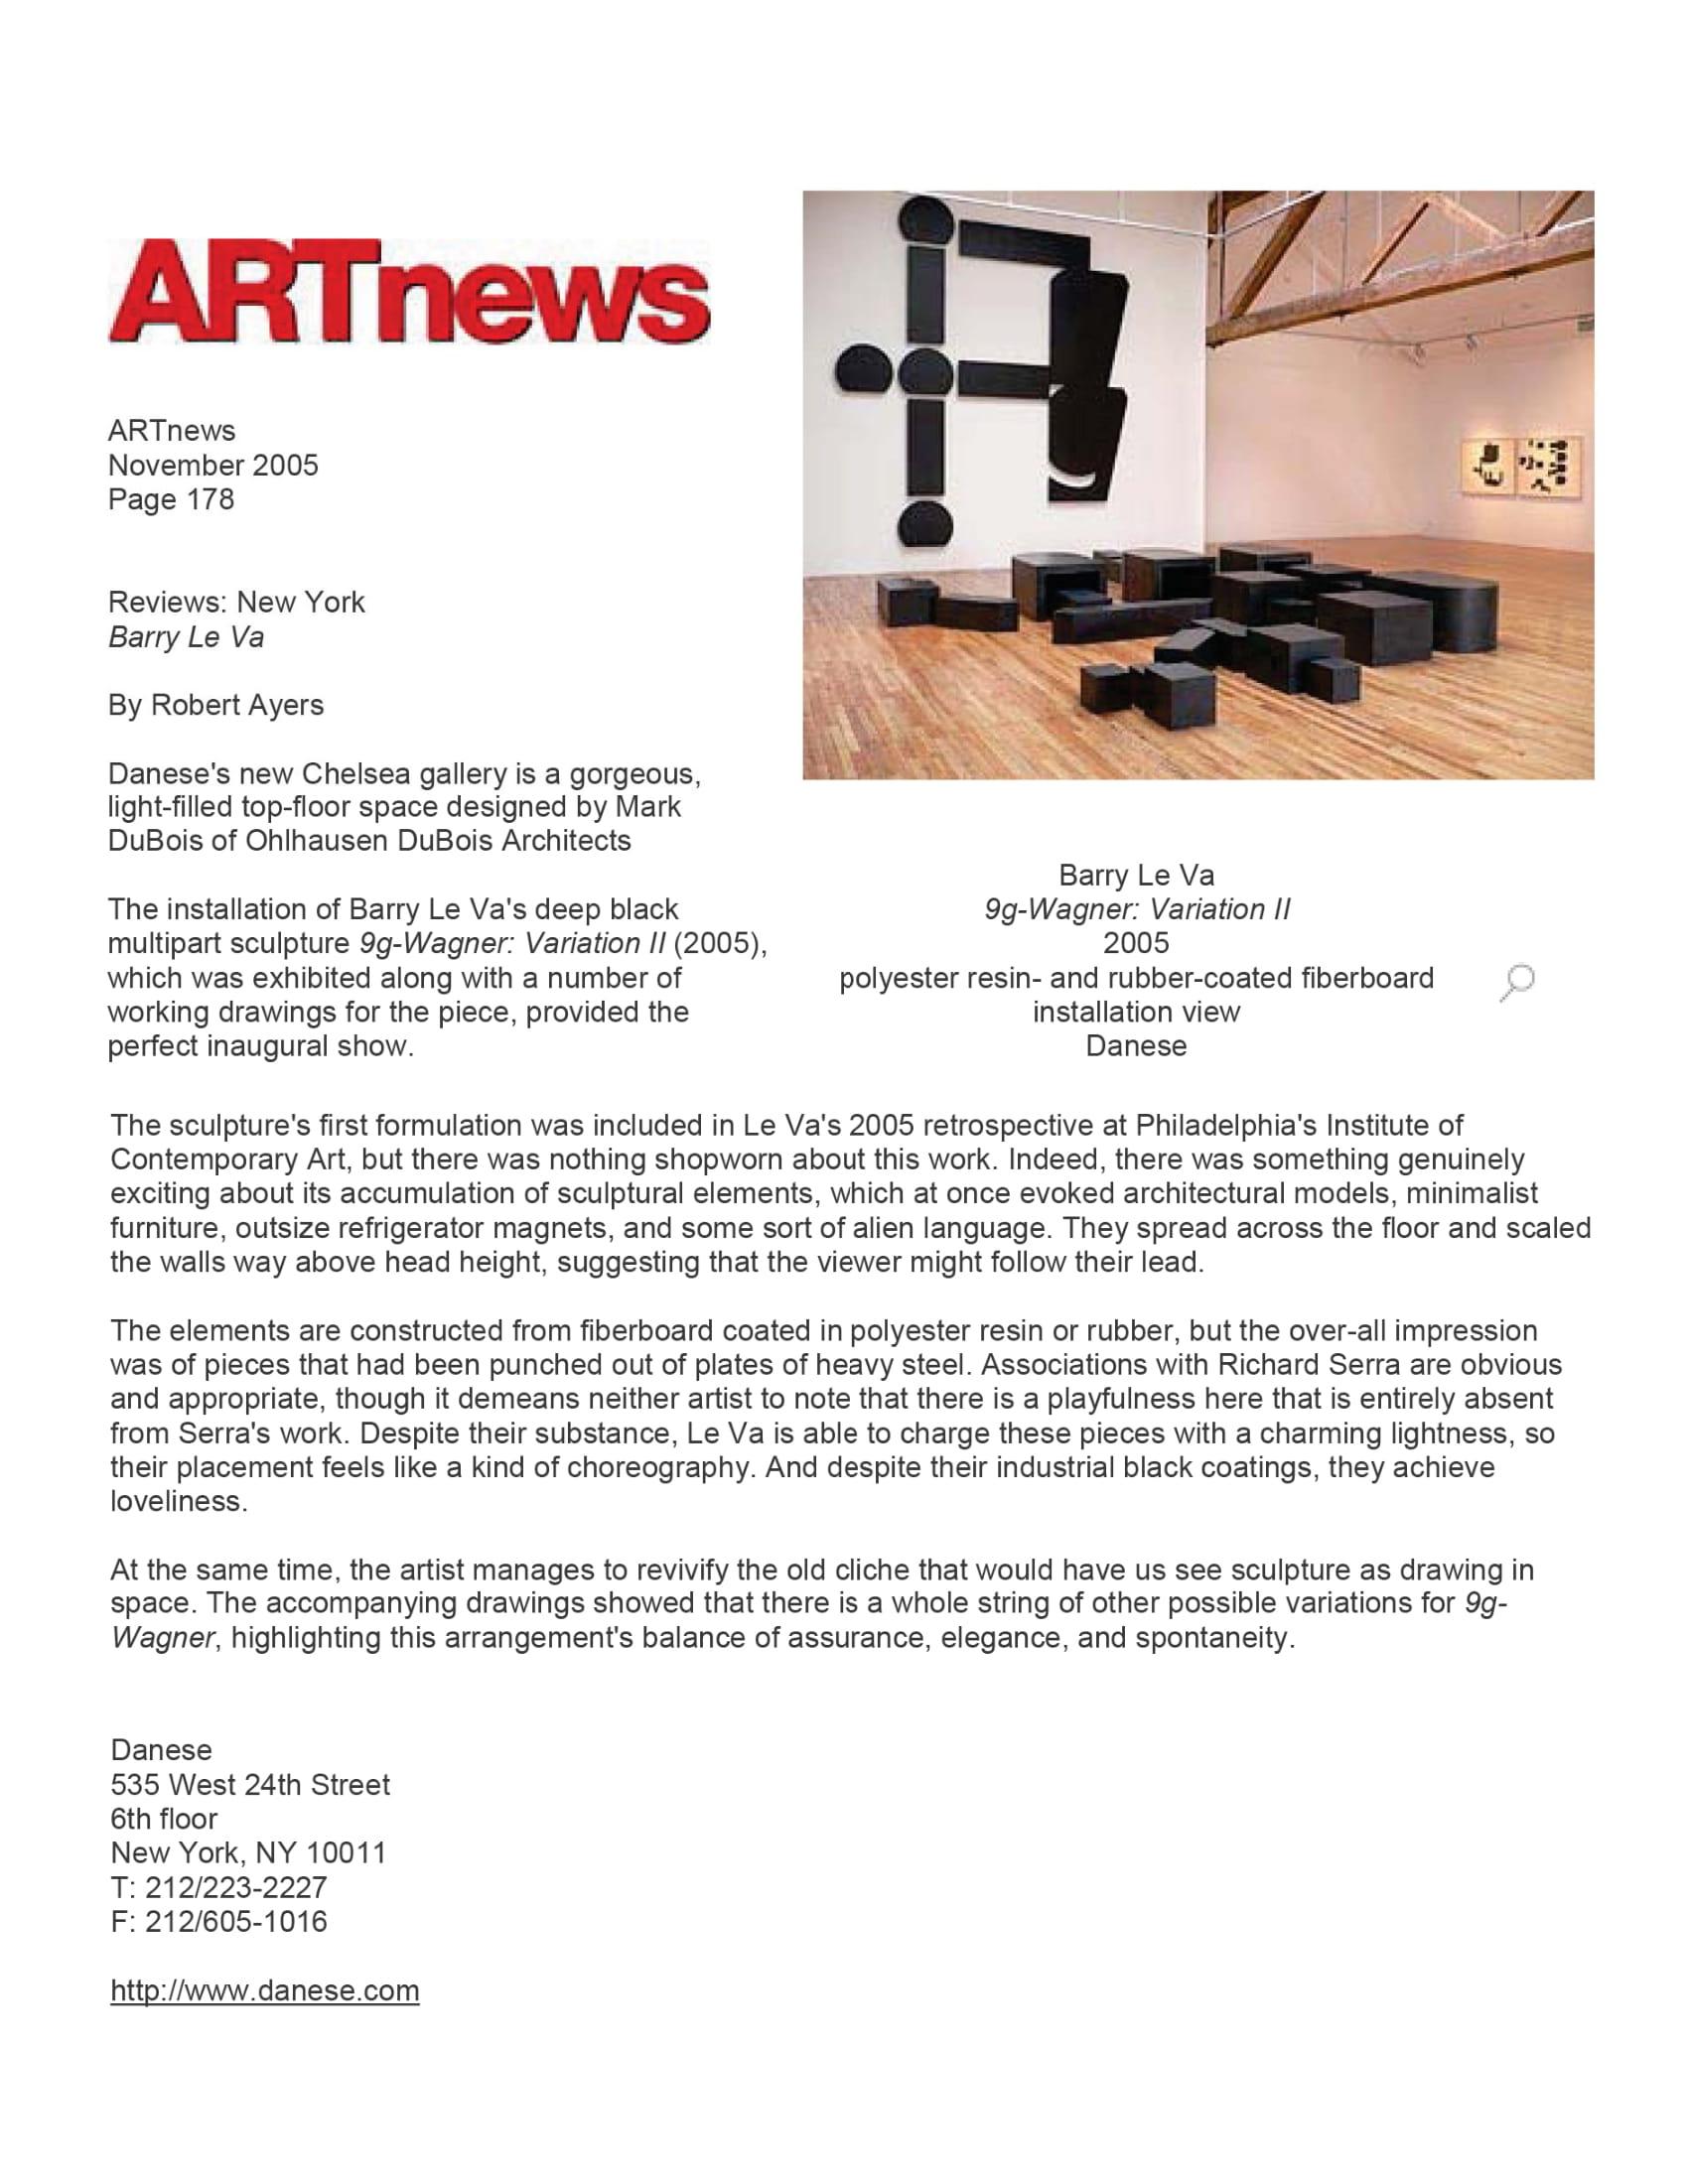 DuBois+Danese+ARTnews-1.jpg